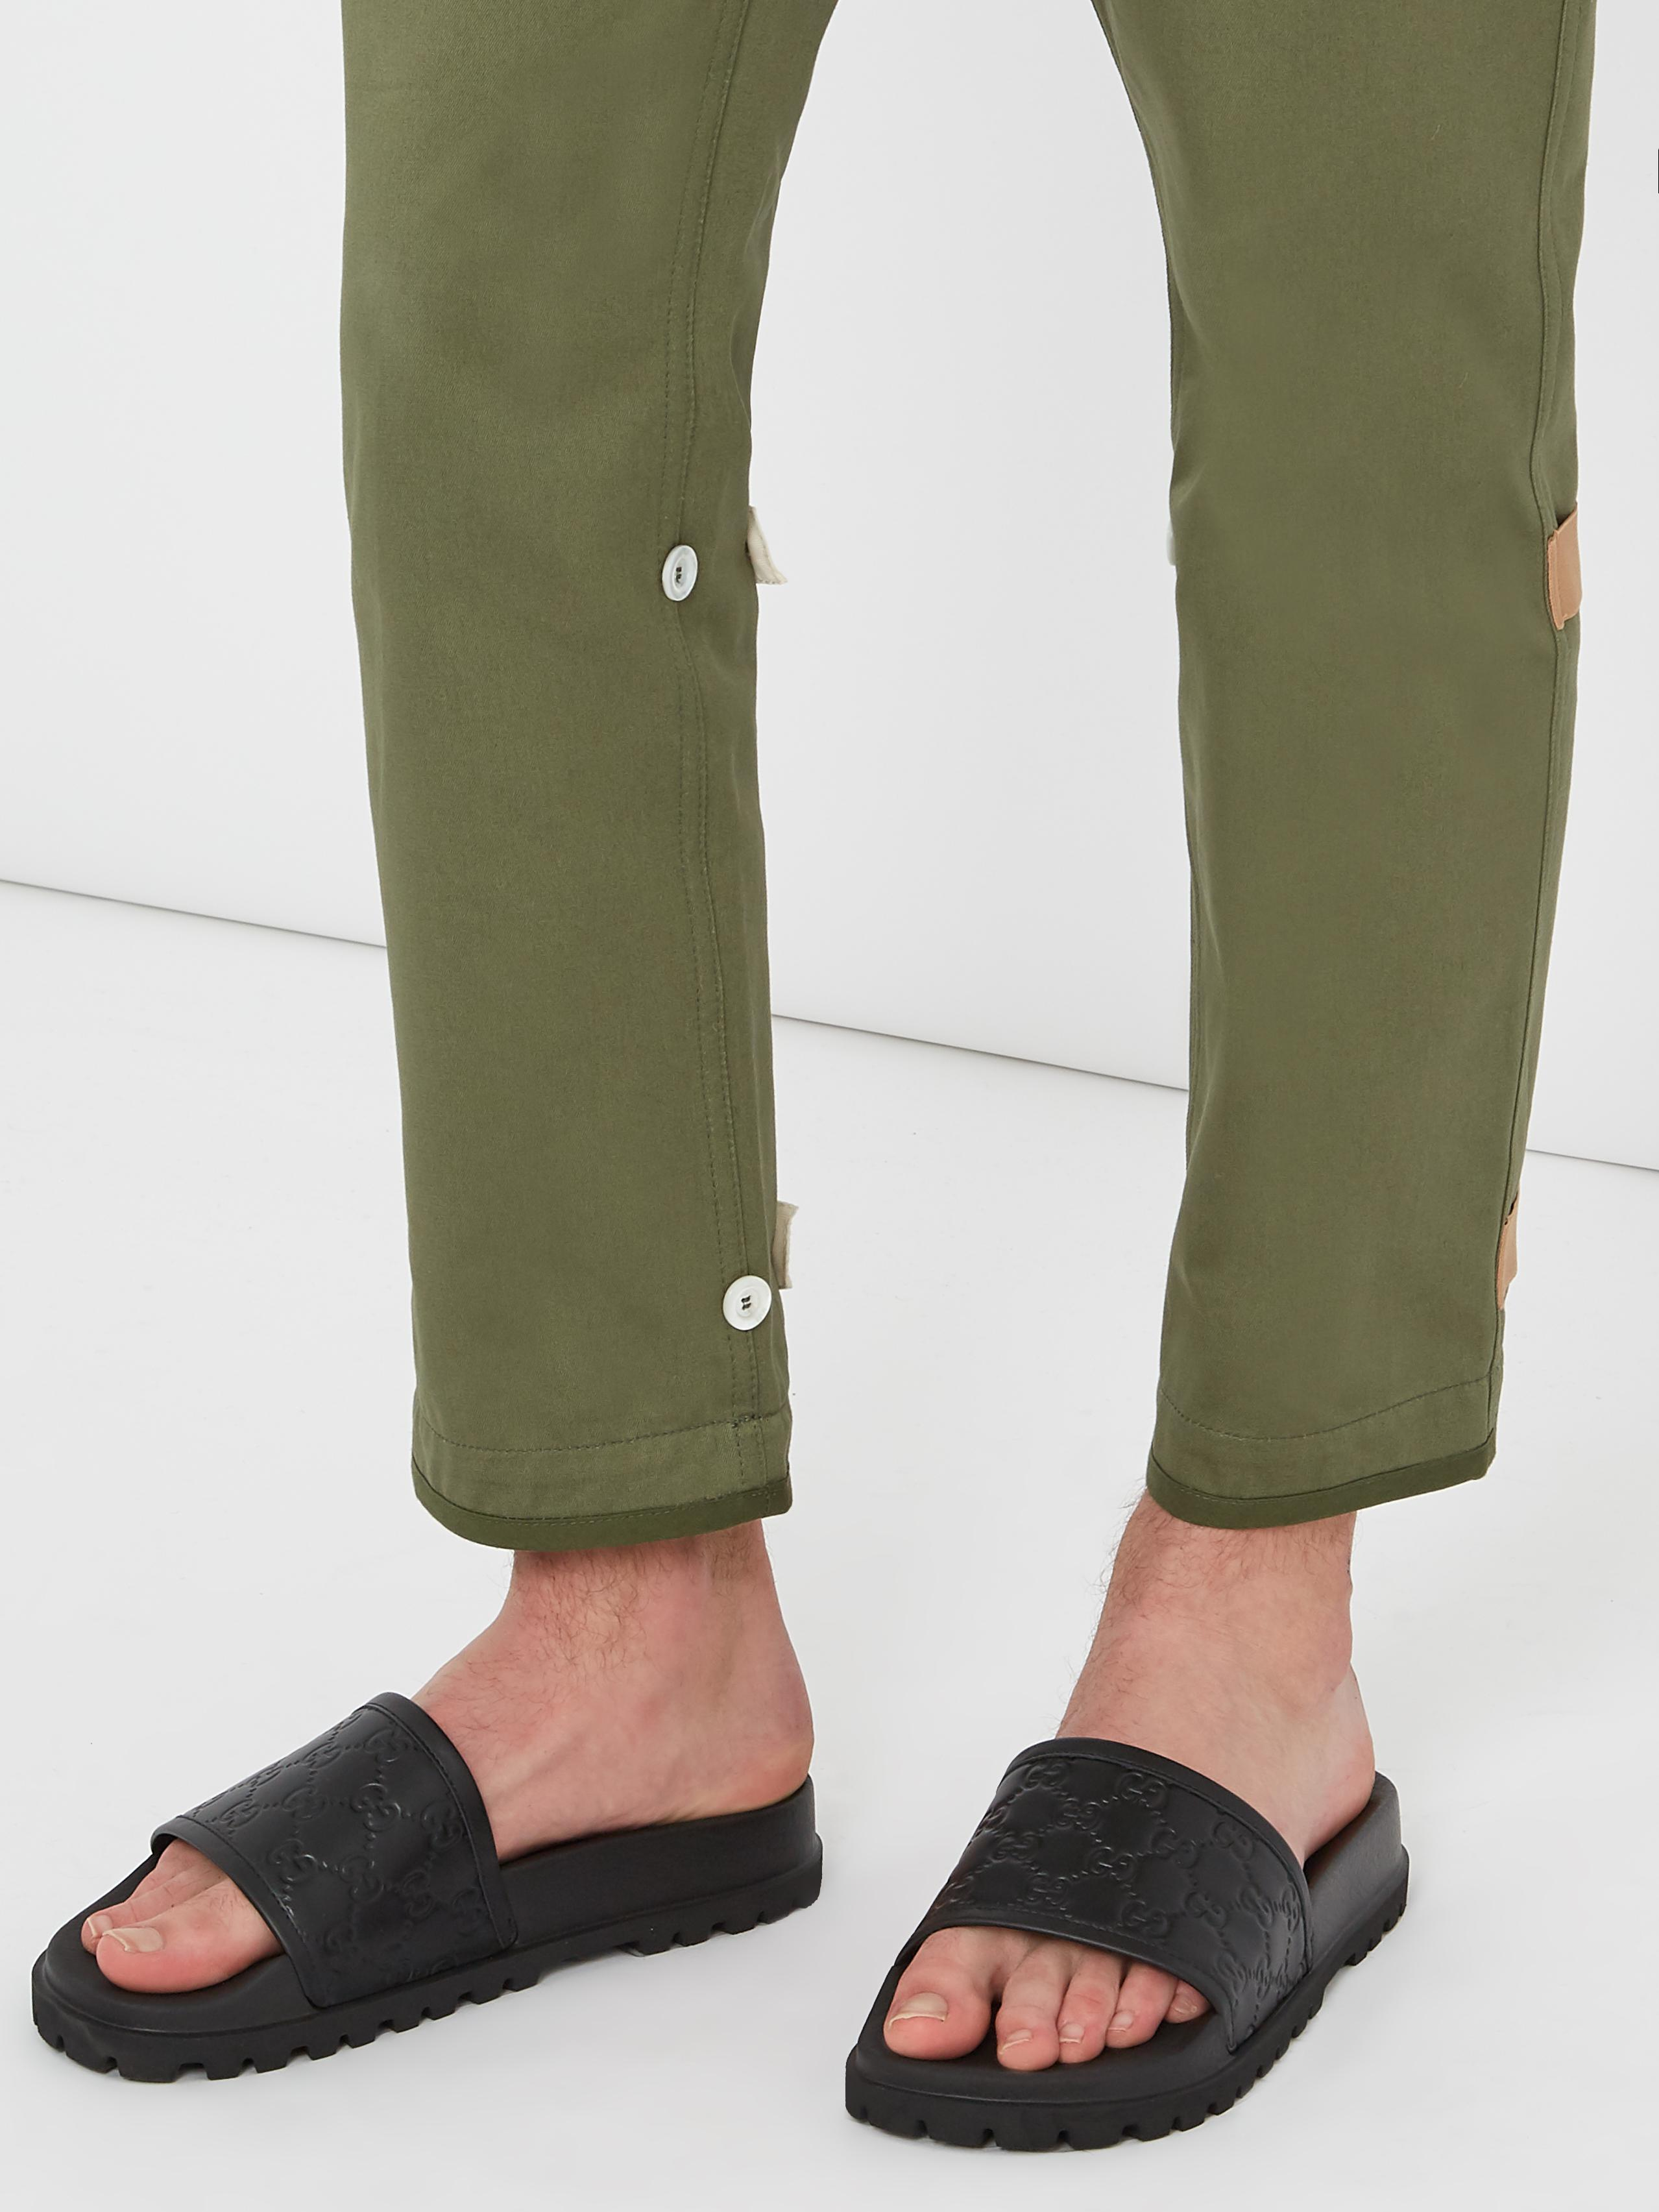 b441d0afa Gucci Pursuit Track Leather Slides in Black for Men - Lyst